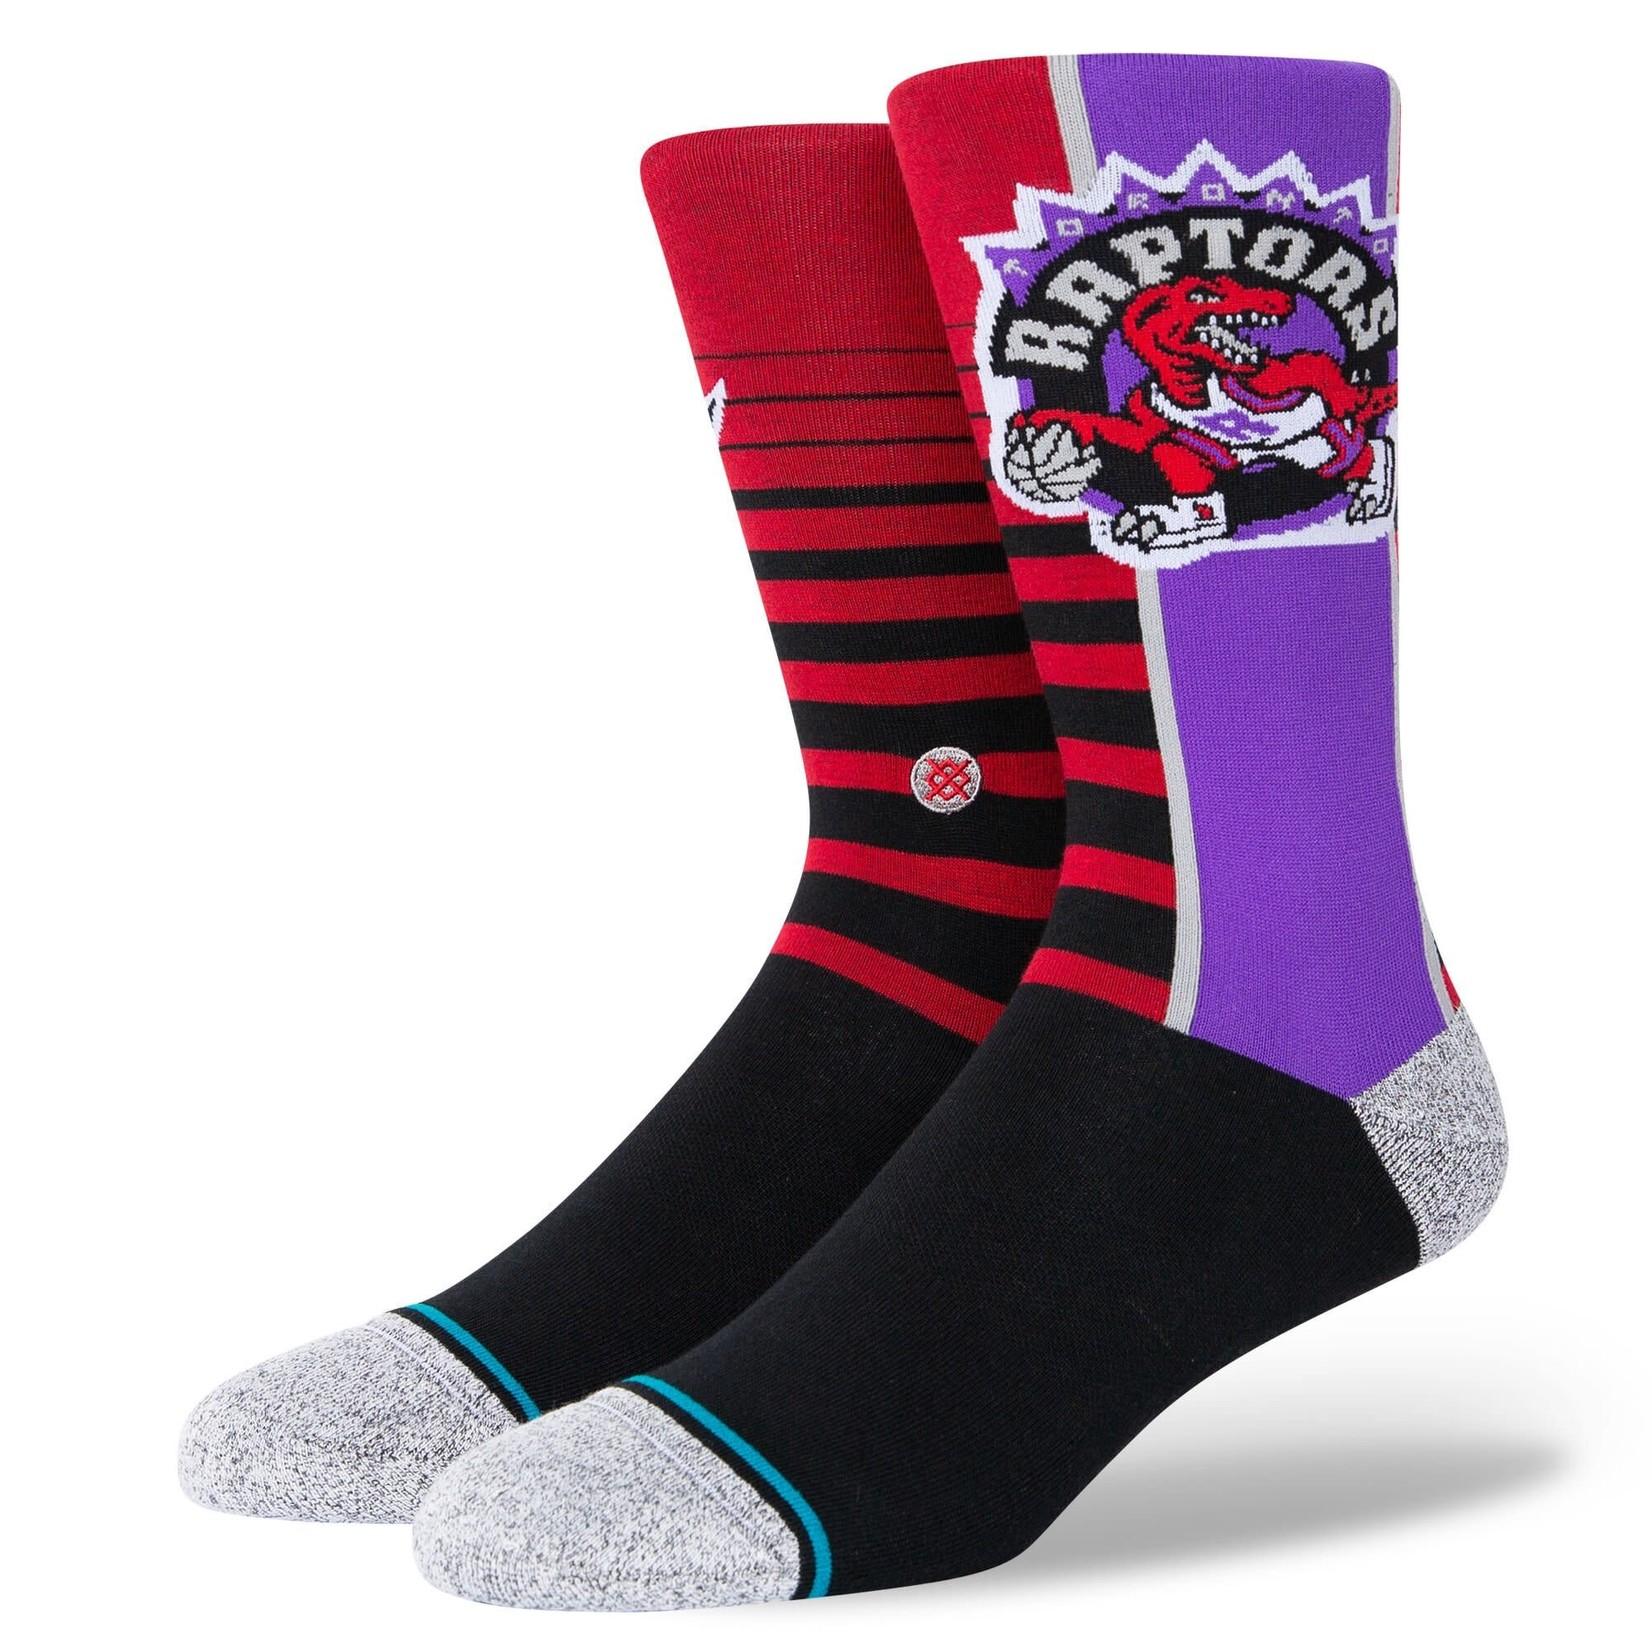 Stance Stance Socks, NBA Raptors Gradient